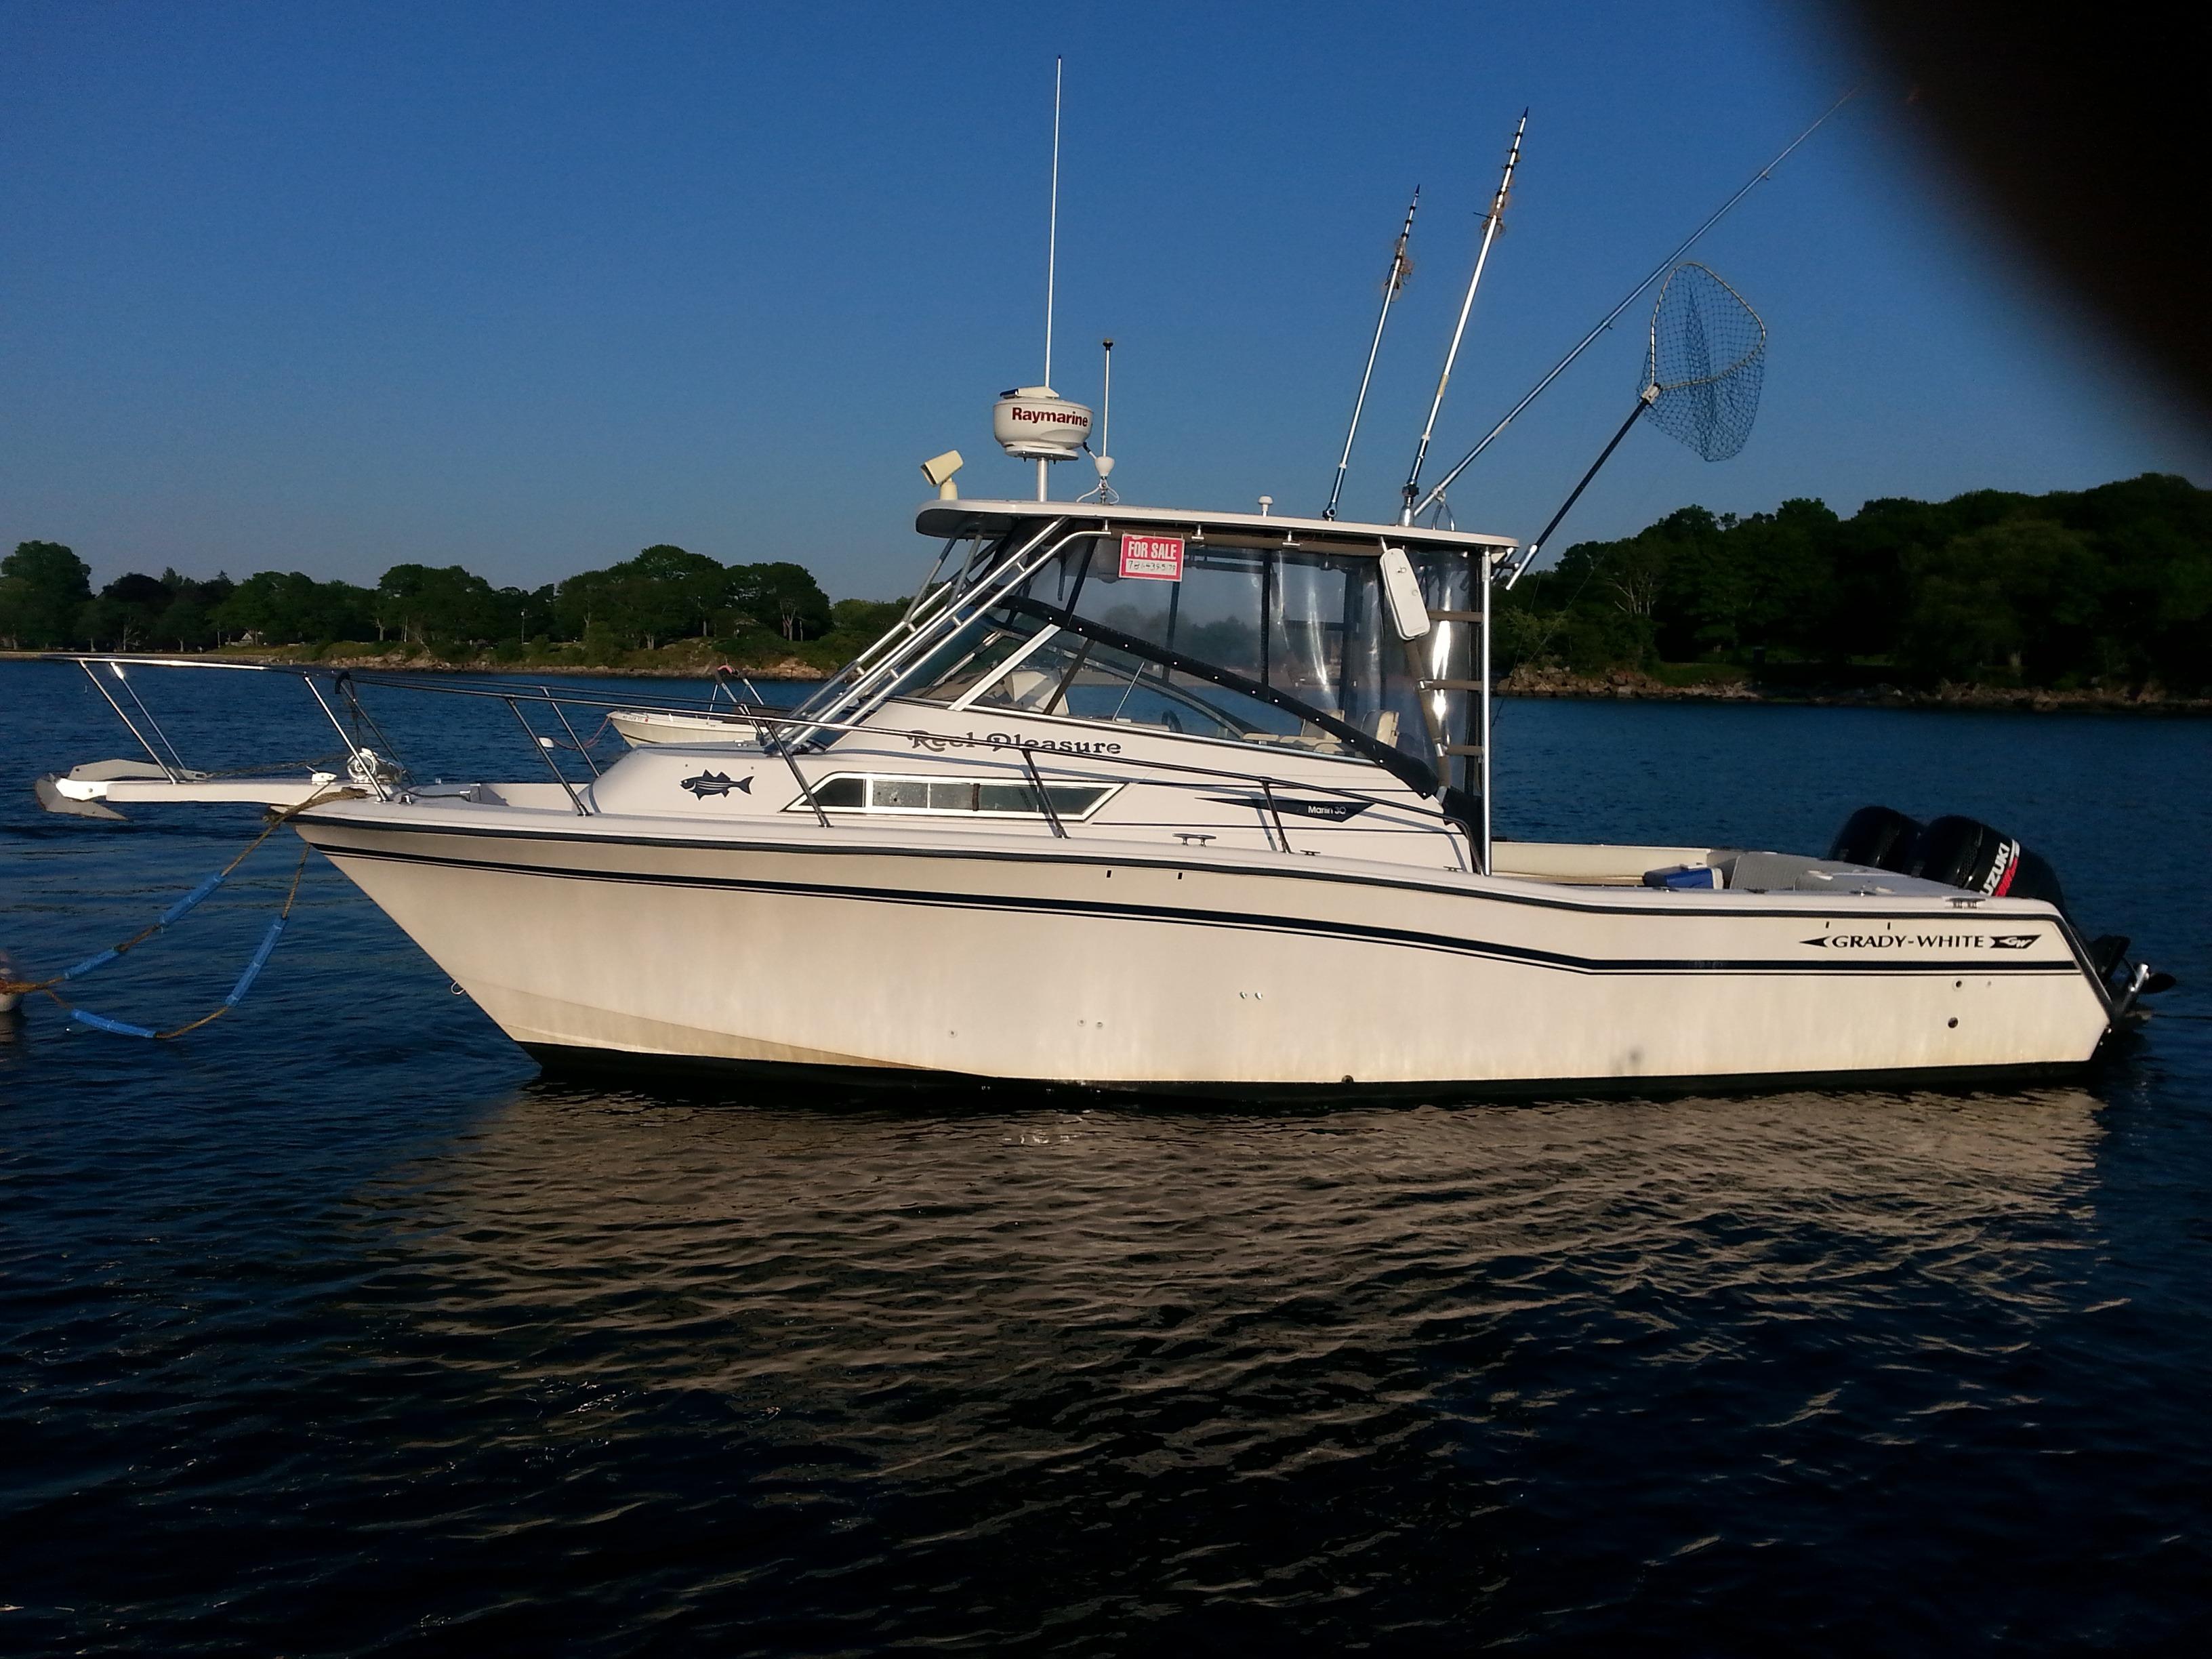 Grady-White 30 Marlin Wa